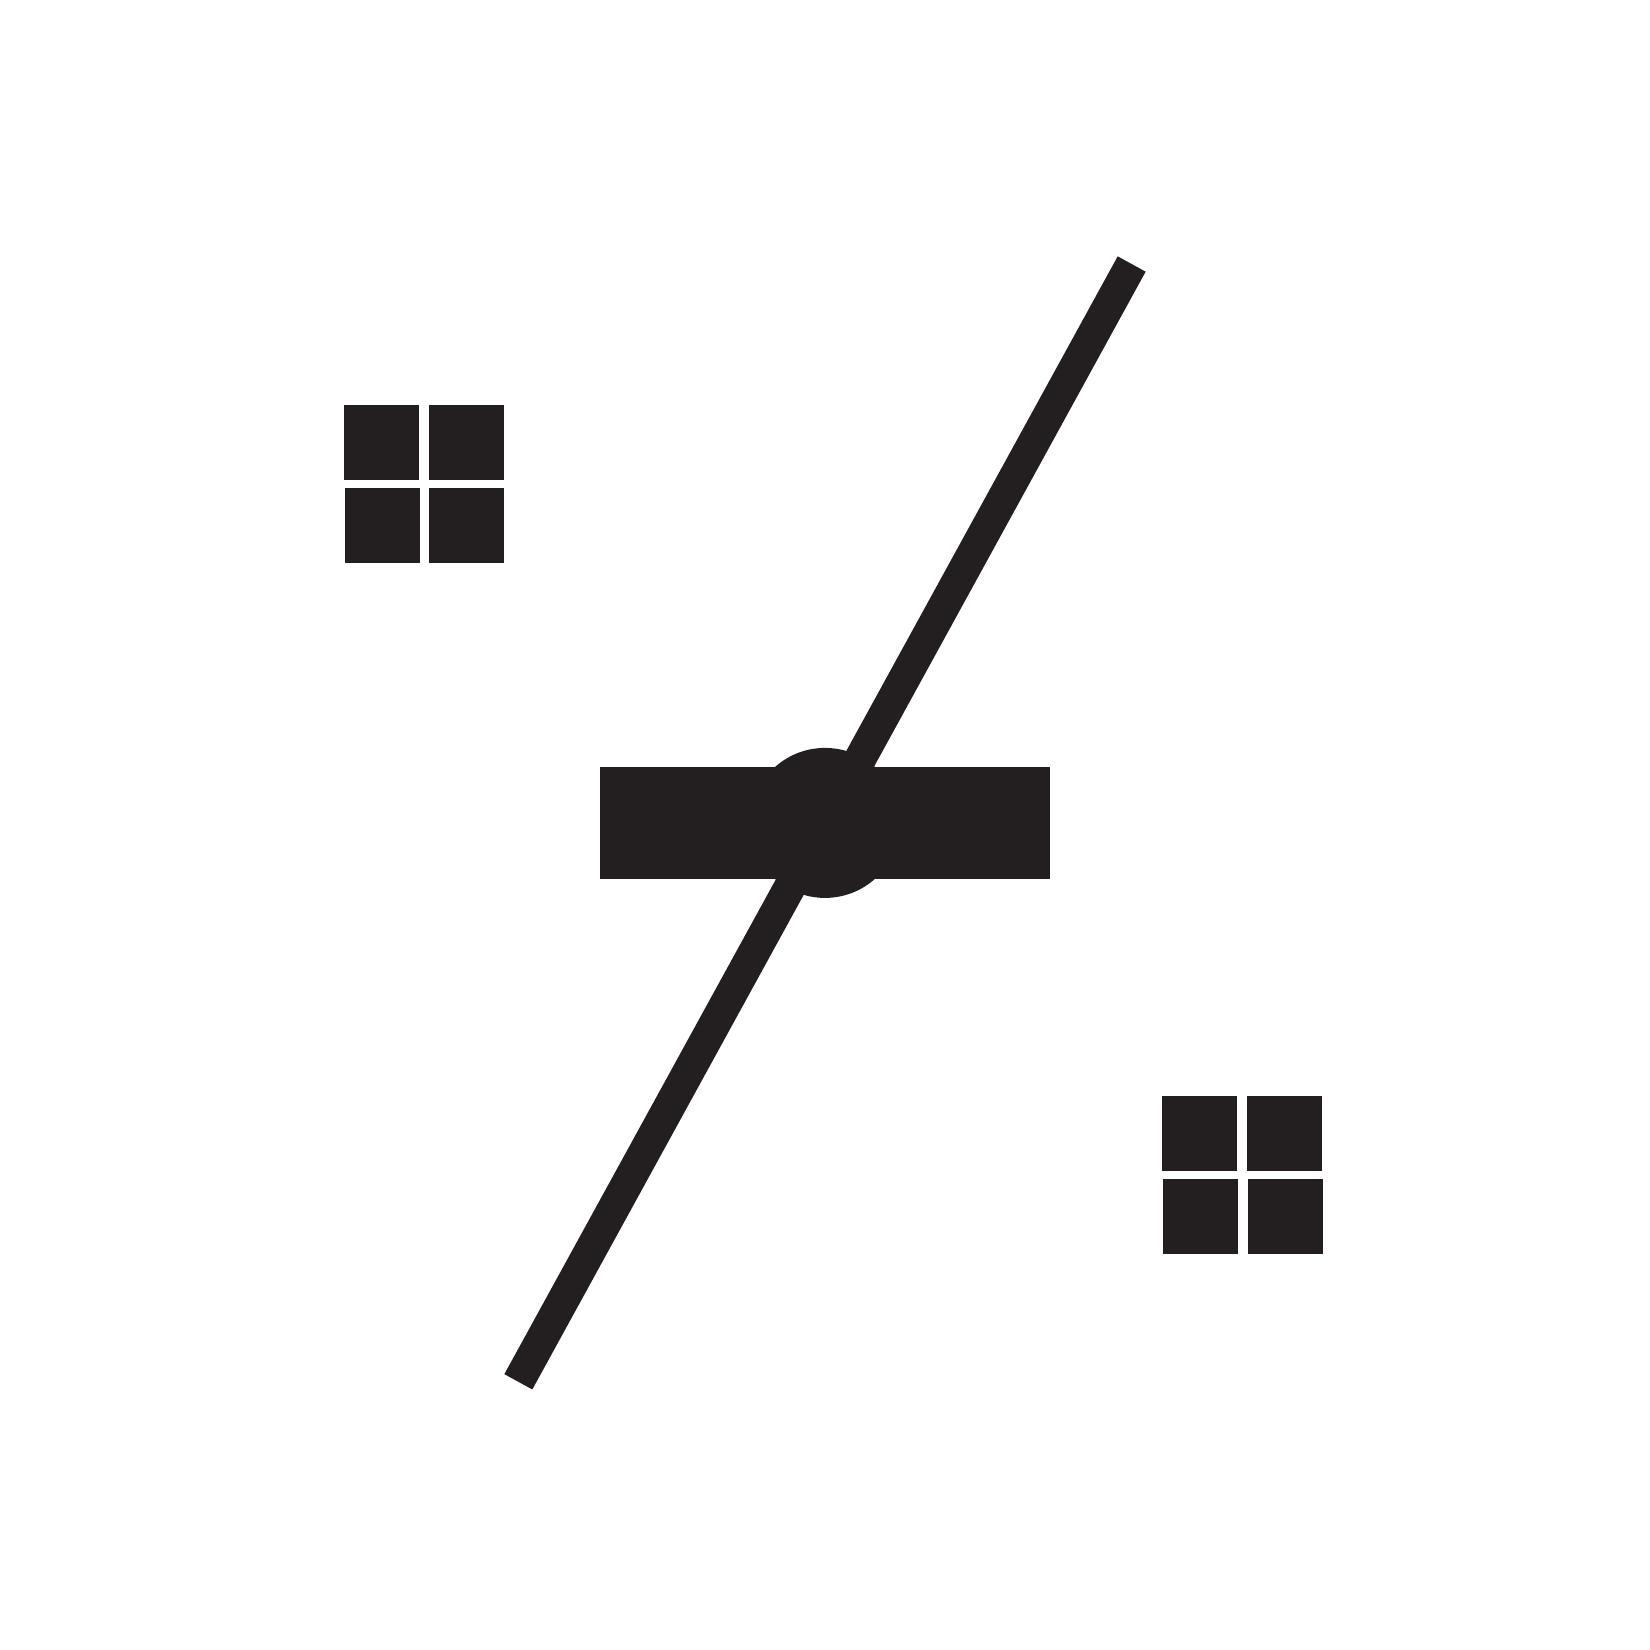 Assignment5_process2#5_shapes_000001.jpg